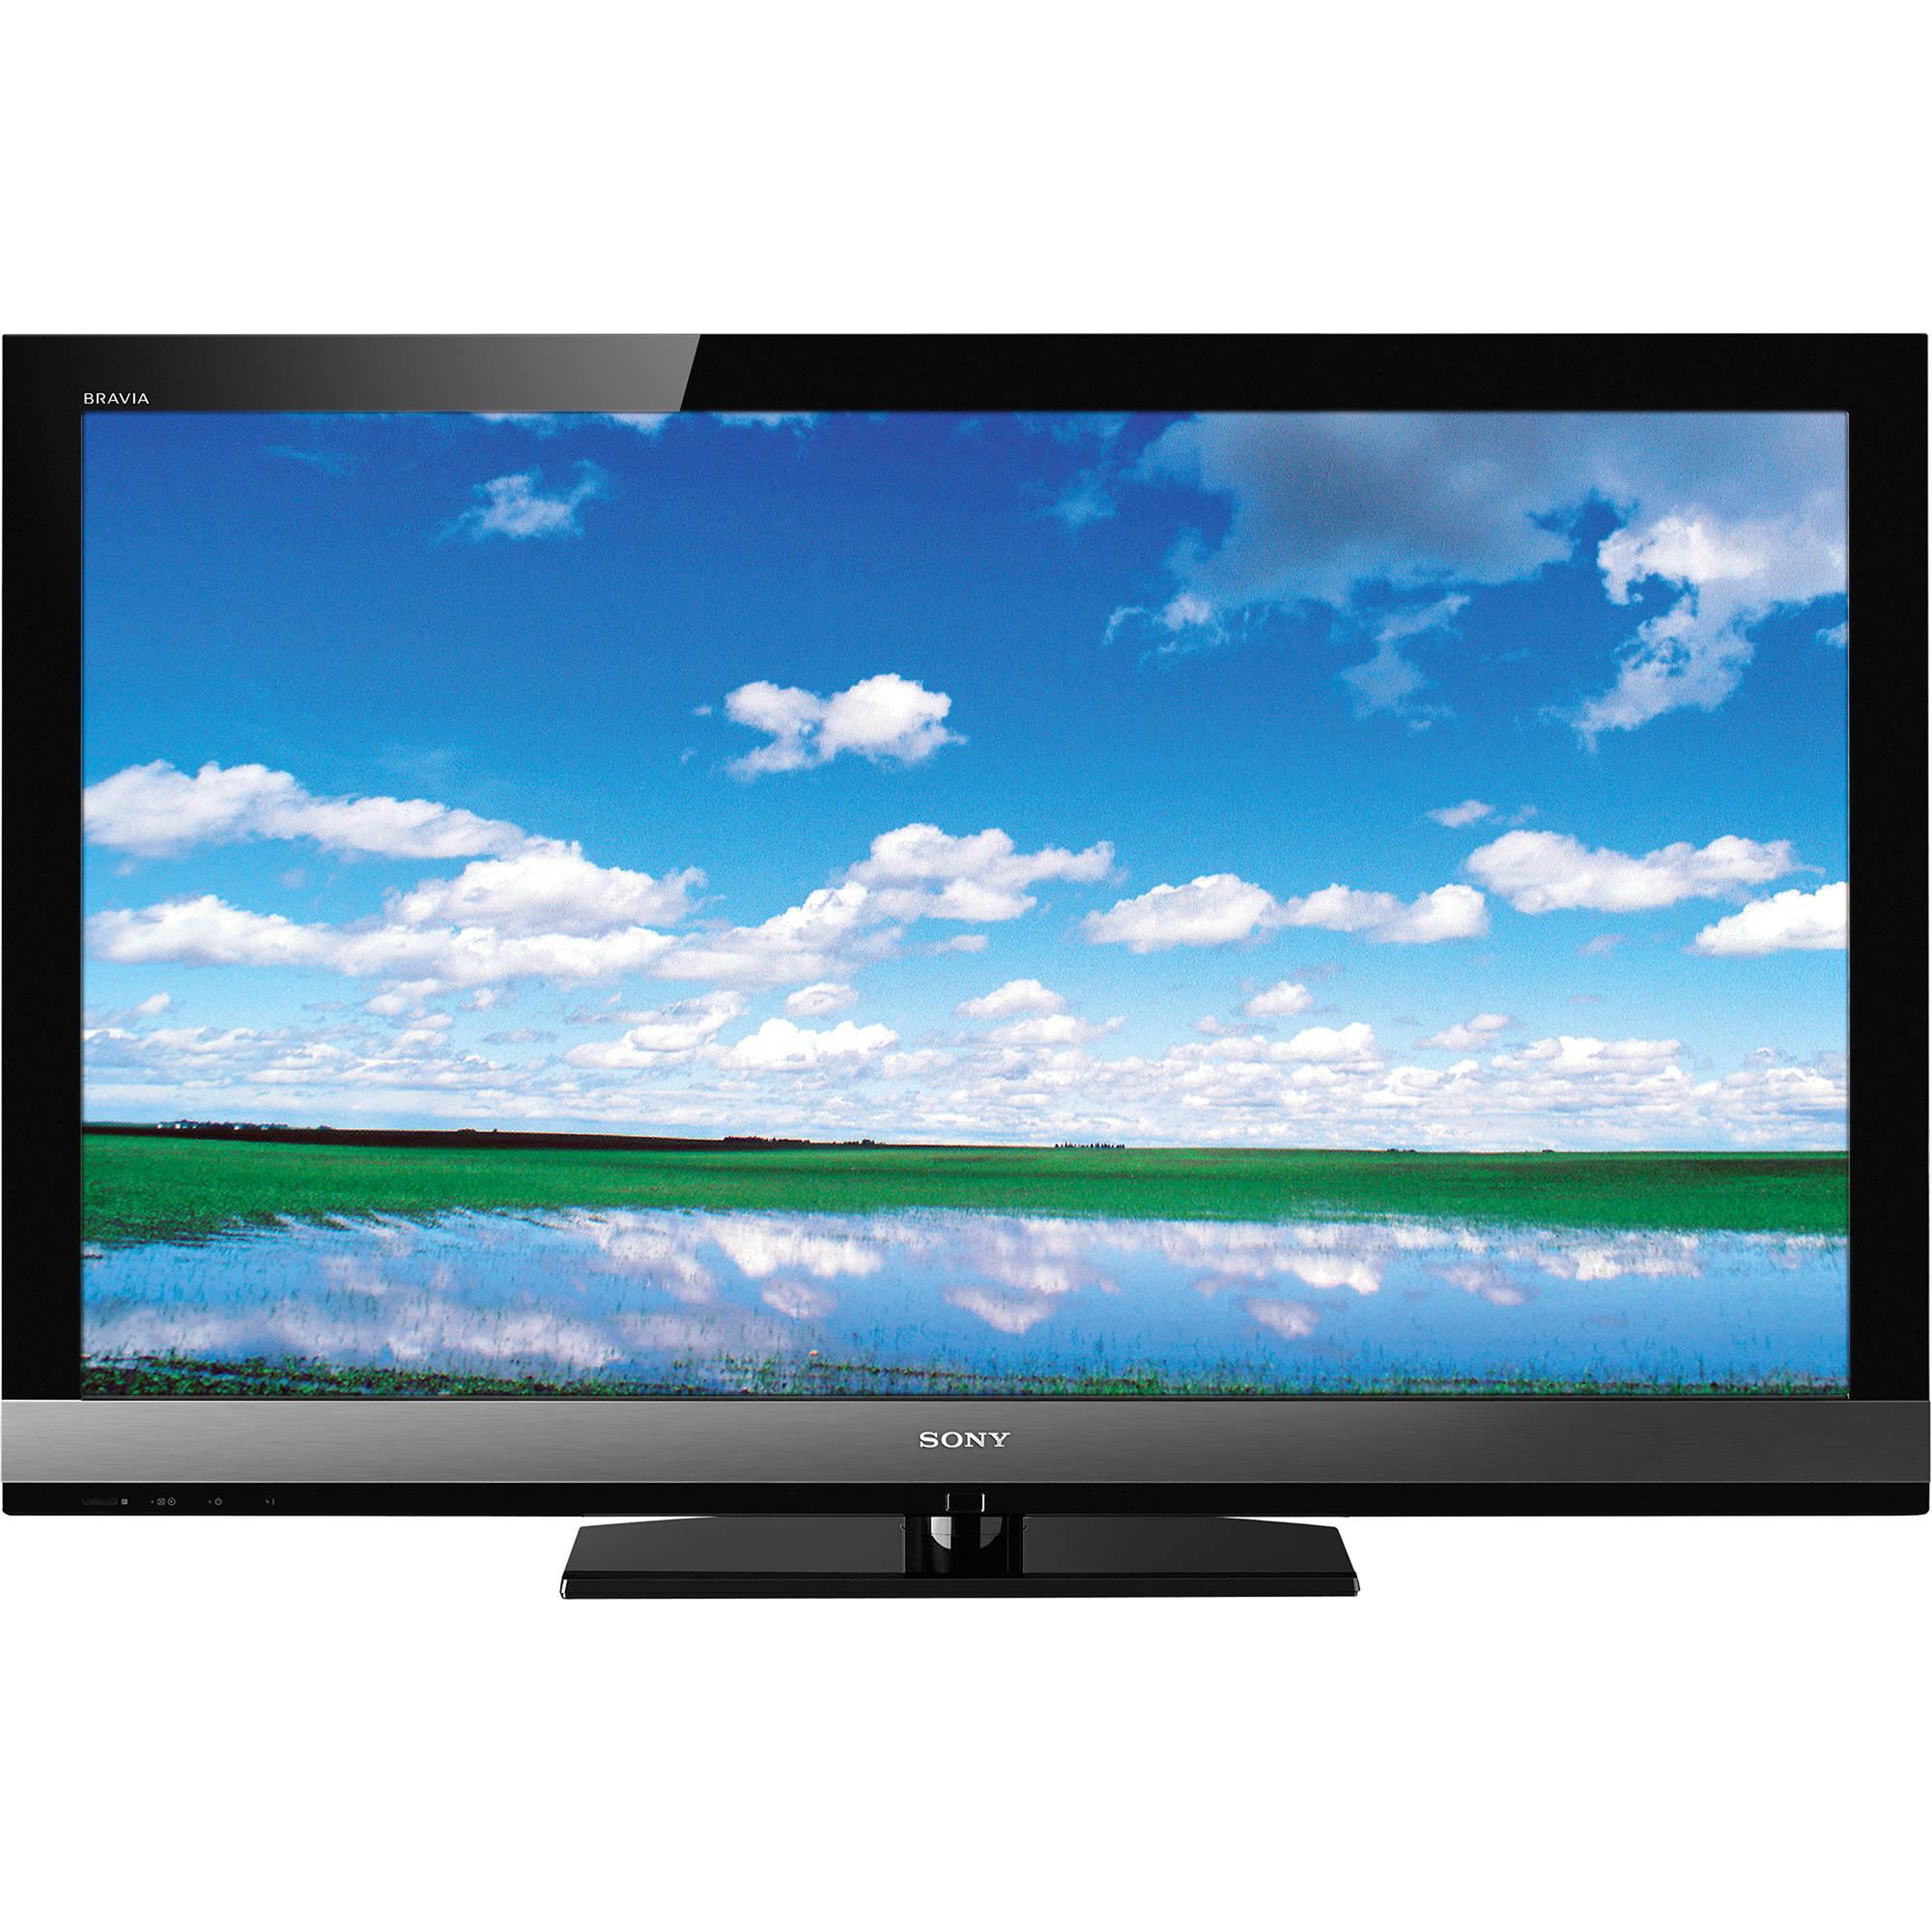 Sony KDL-32EX726 BRAVIA HDTV Driver PC